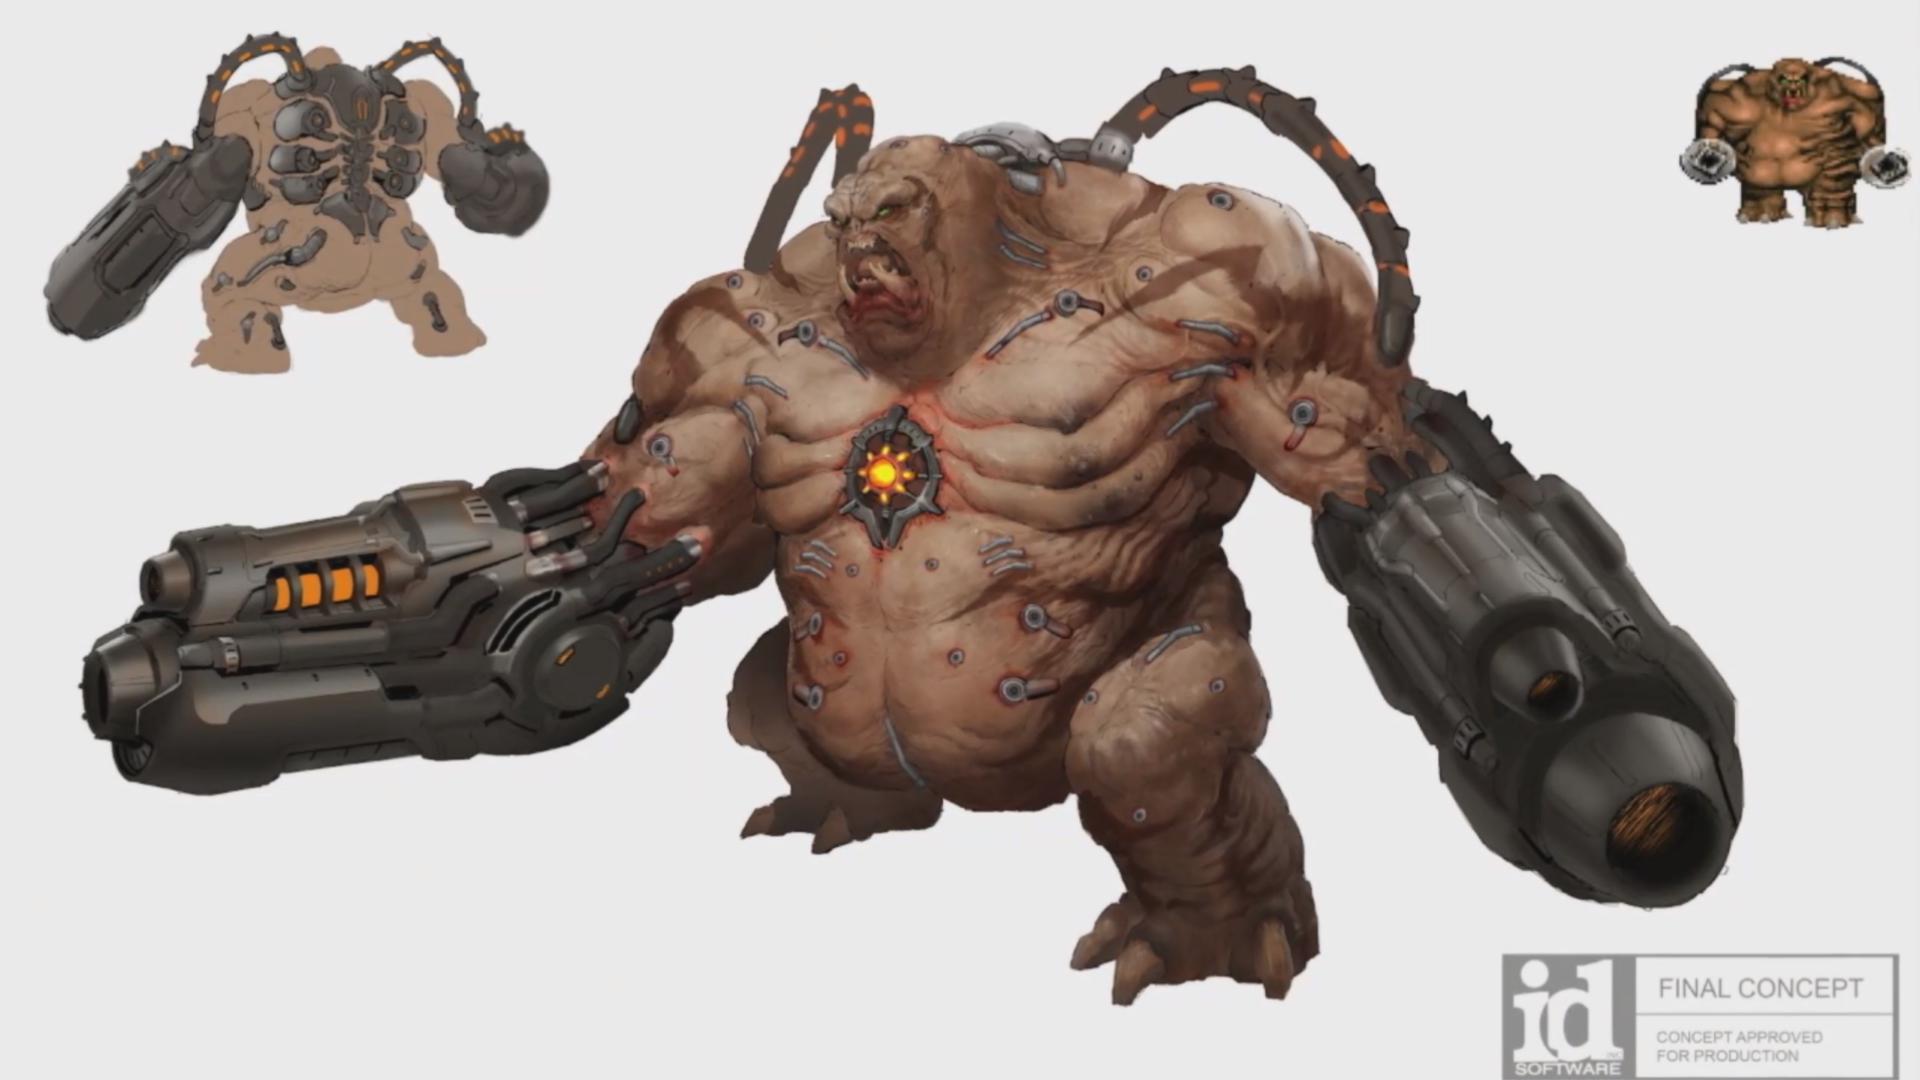 https://www.pcgamesn.com/wp-content/uploads/2018/08/Doom-Eternal-enemy-concept.jpg